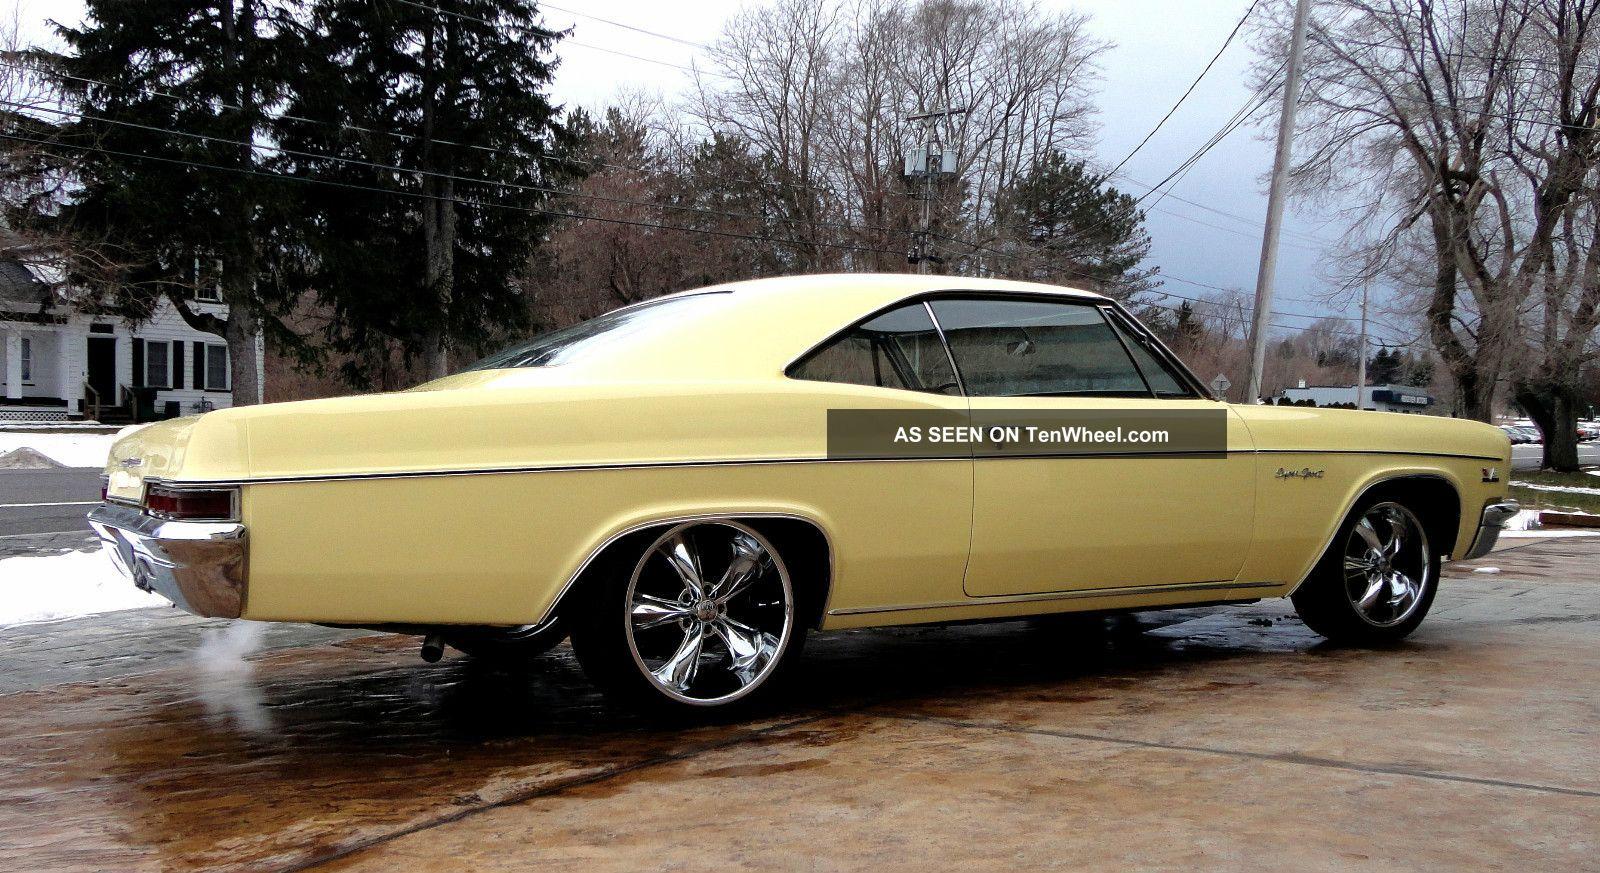 1966 Chevy Impala Ss Lowered Big Block Foose Wheels Impala photo